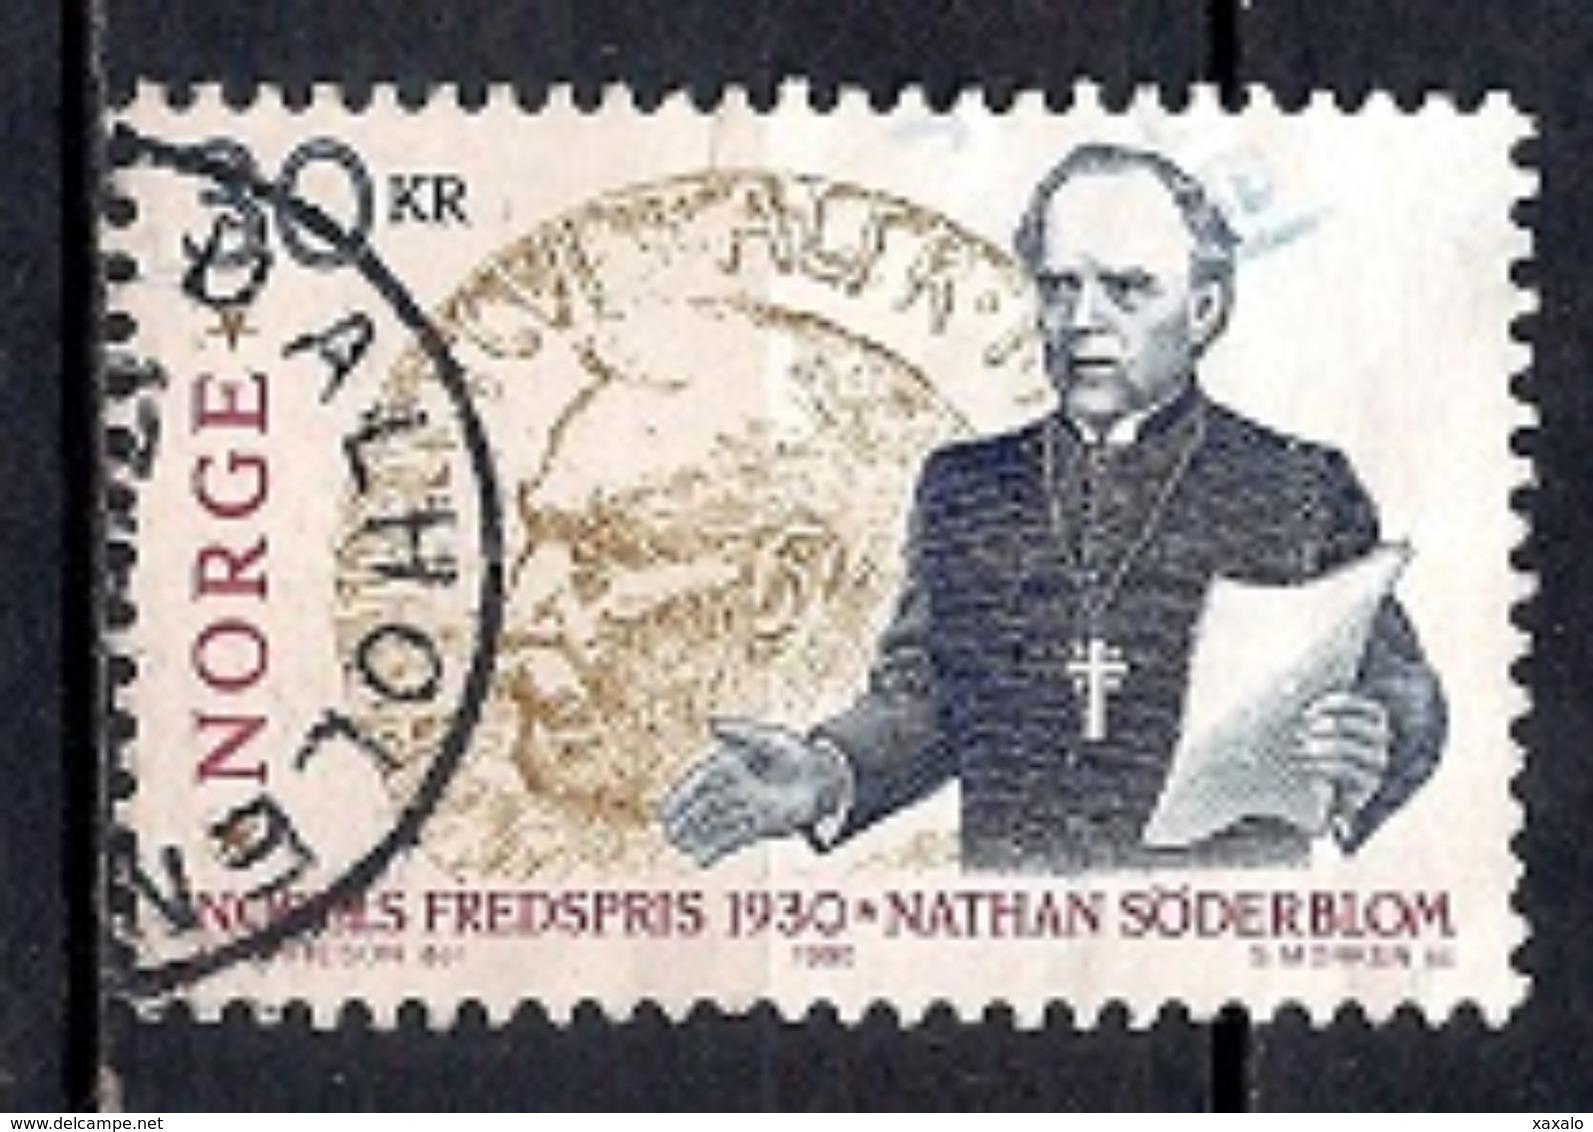 Norway 1990 - The Award Of The Nobel Peace Prize To Archbishop Nathen Søderblom - Oblitérés